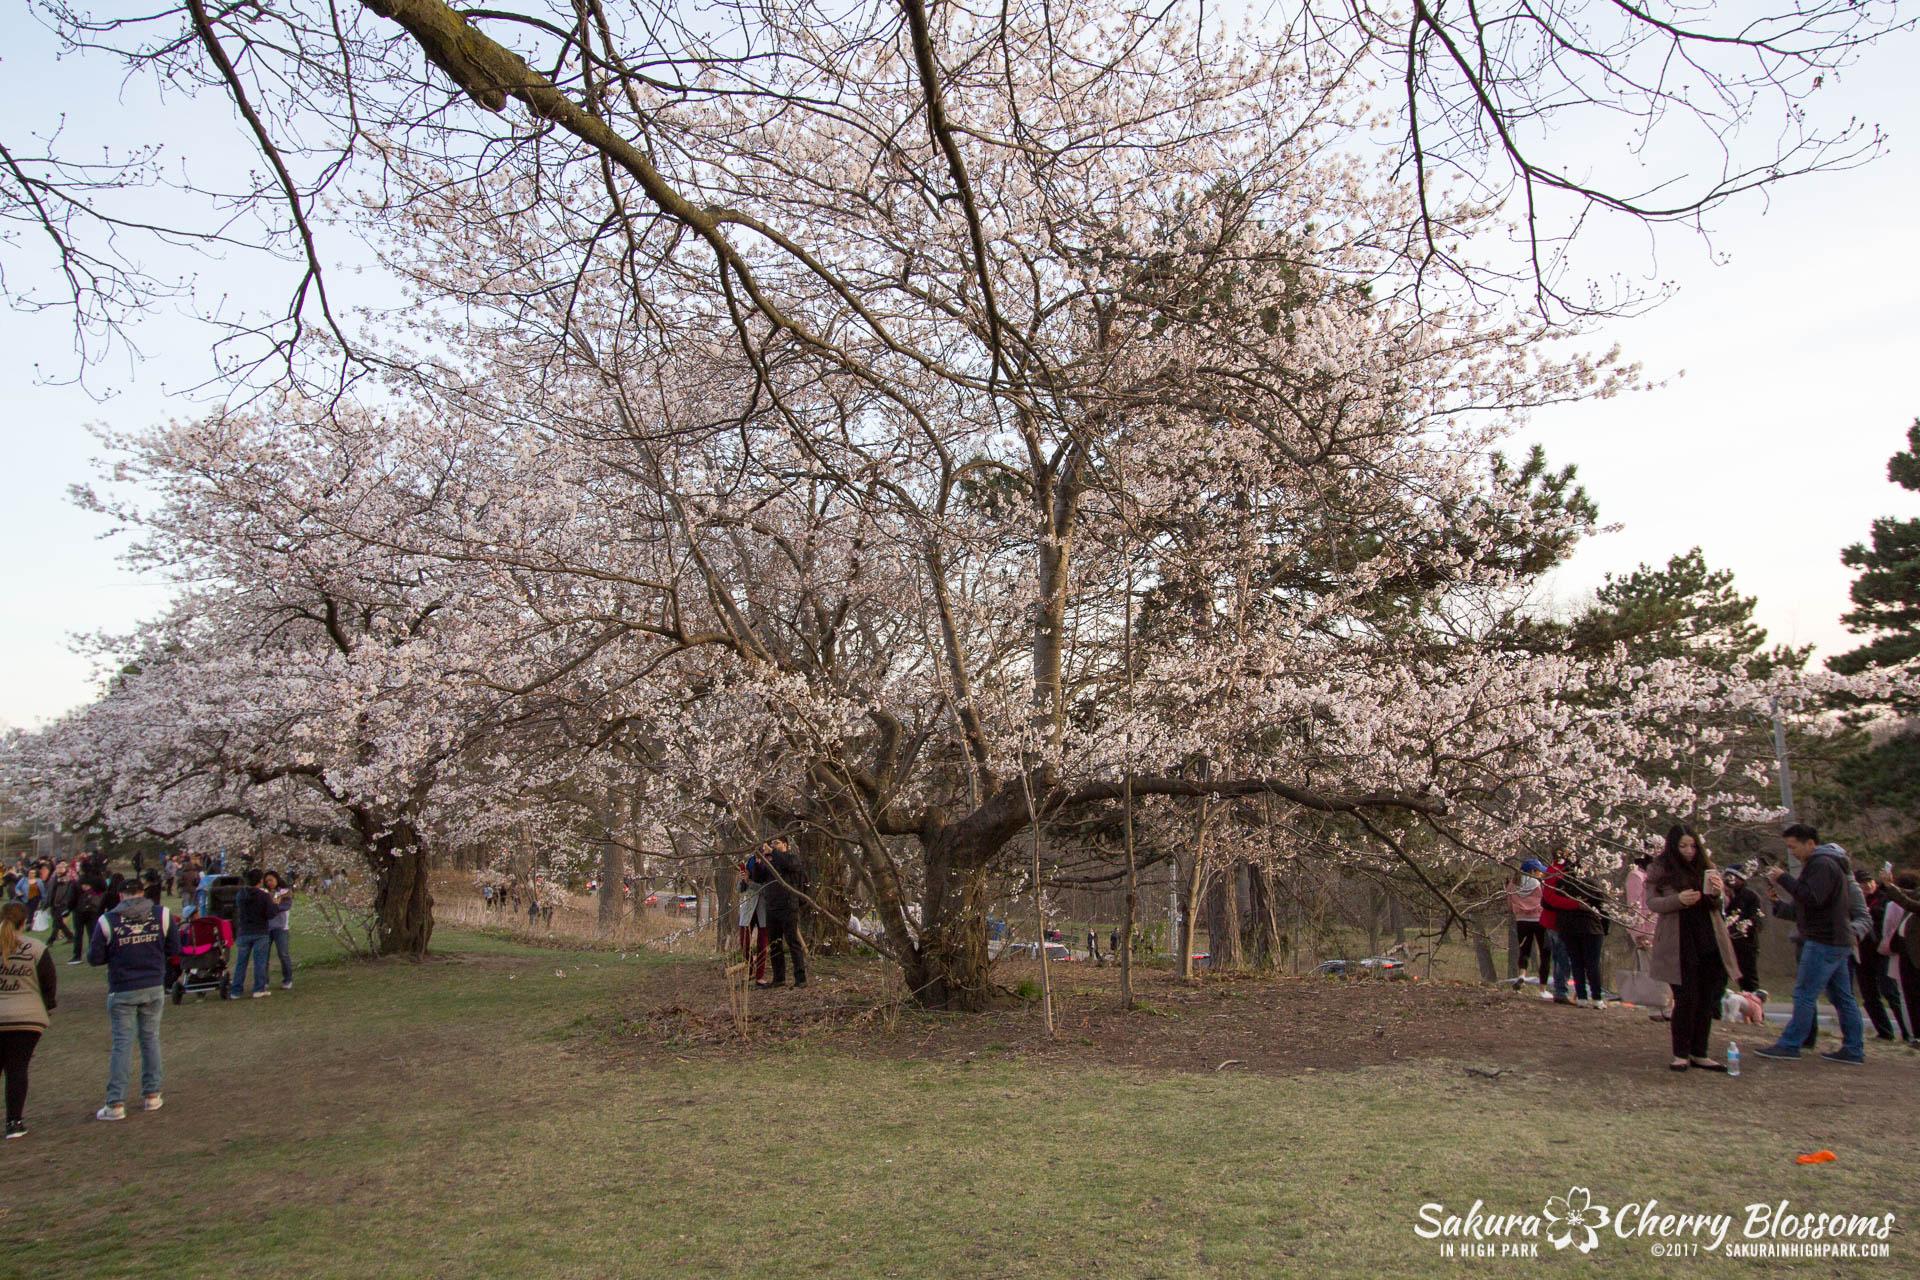 Sakura-Watch-April-24-2017-bloom-has-begun-with-more-to-come-213.jpg